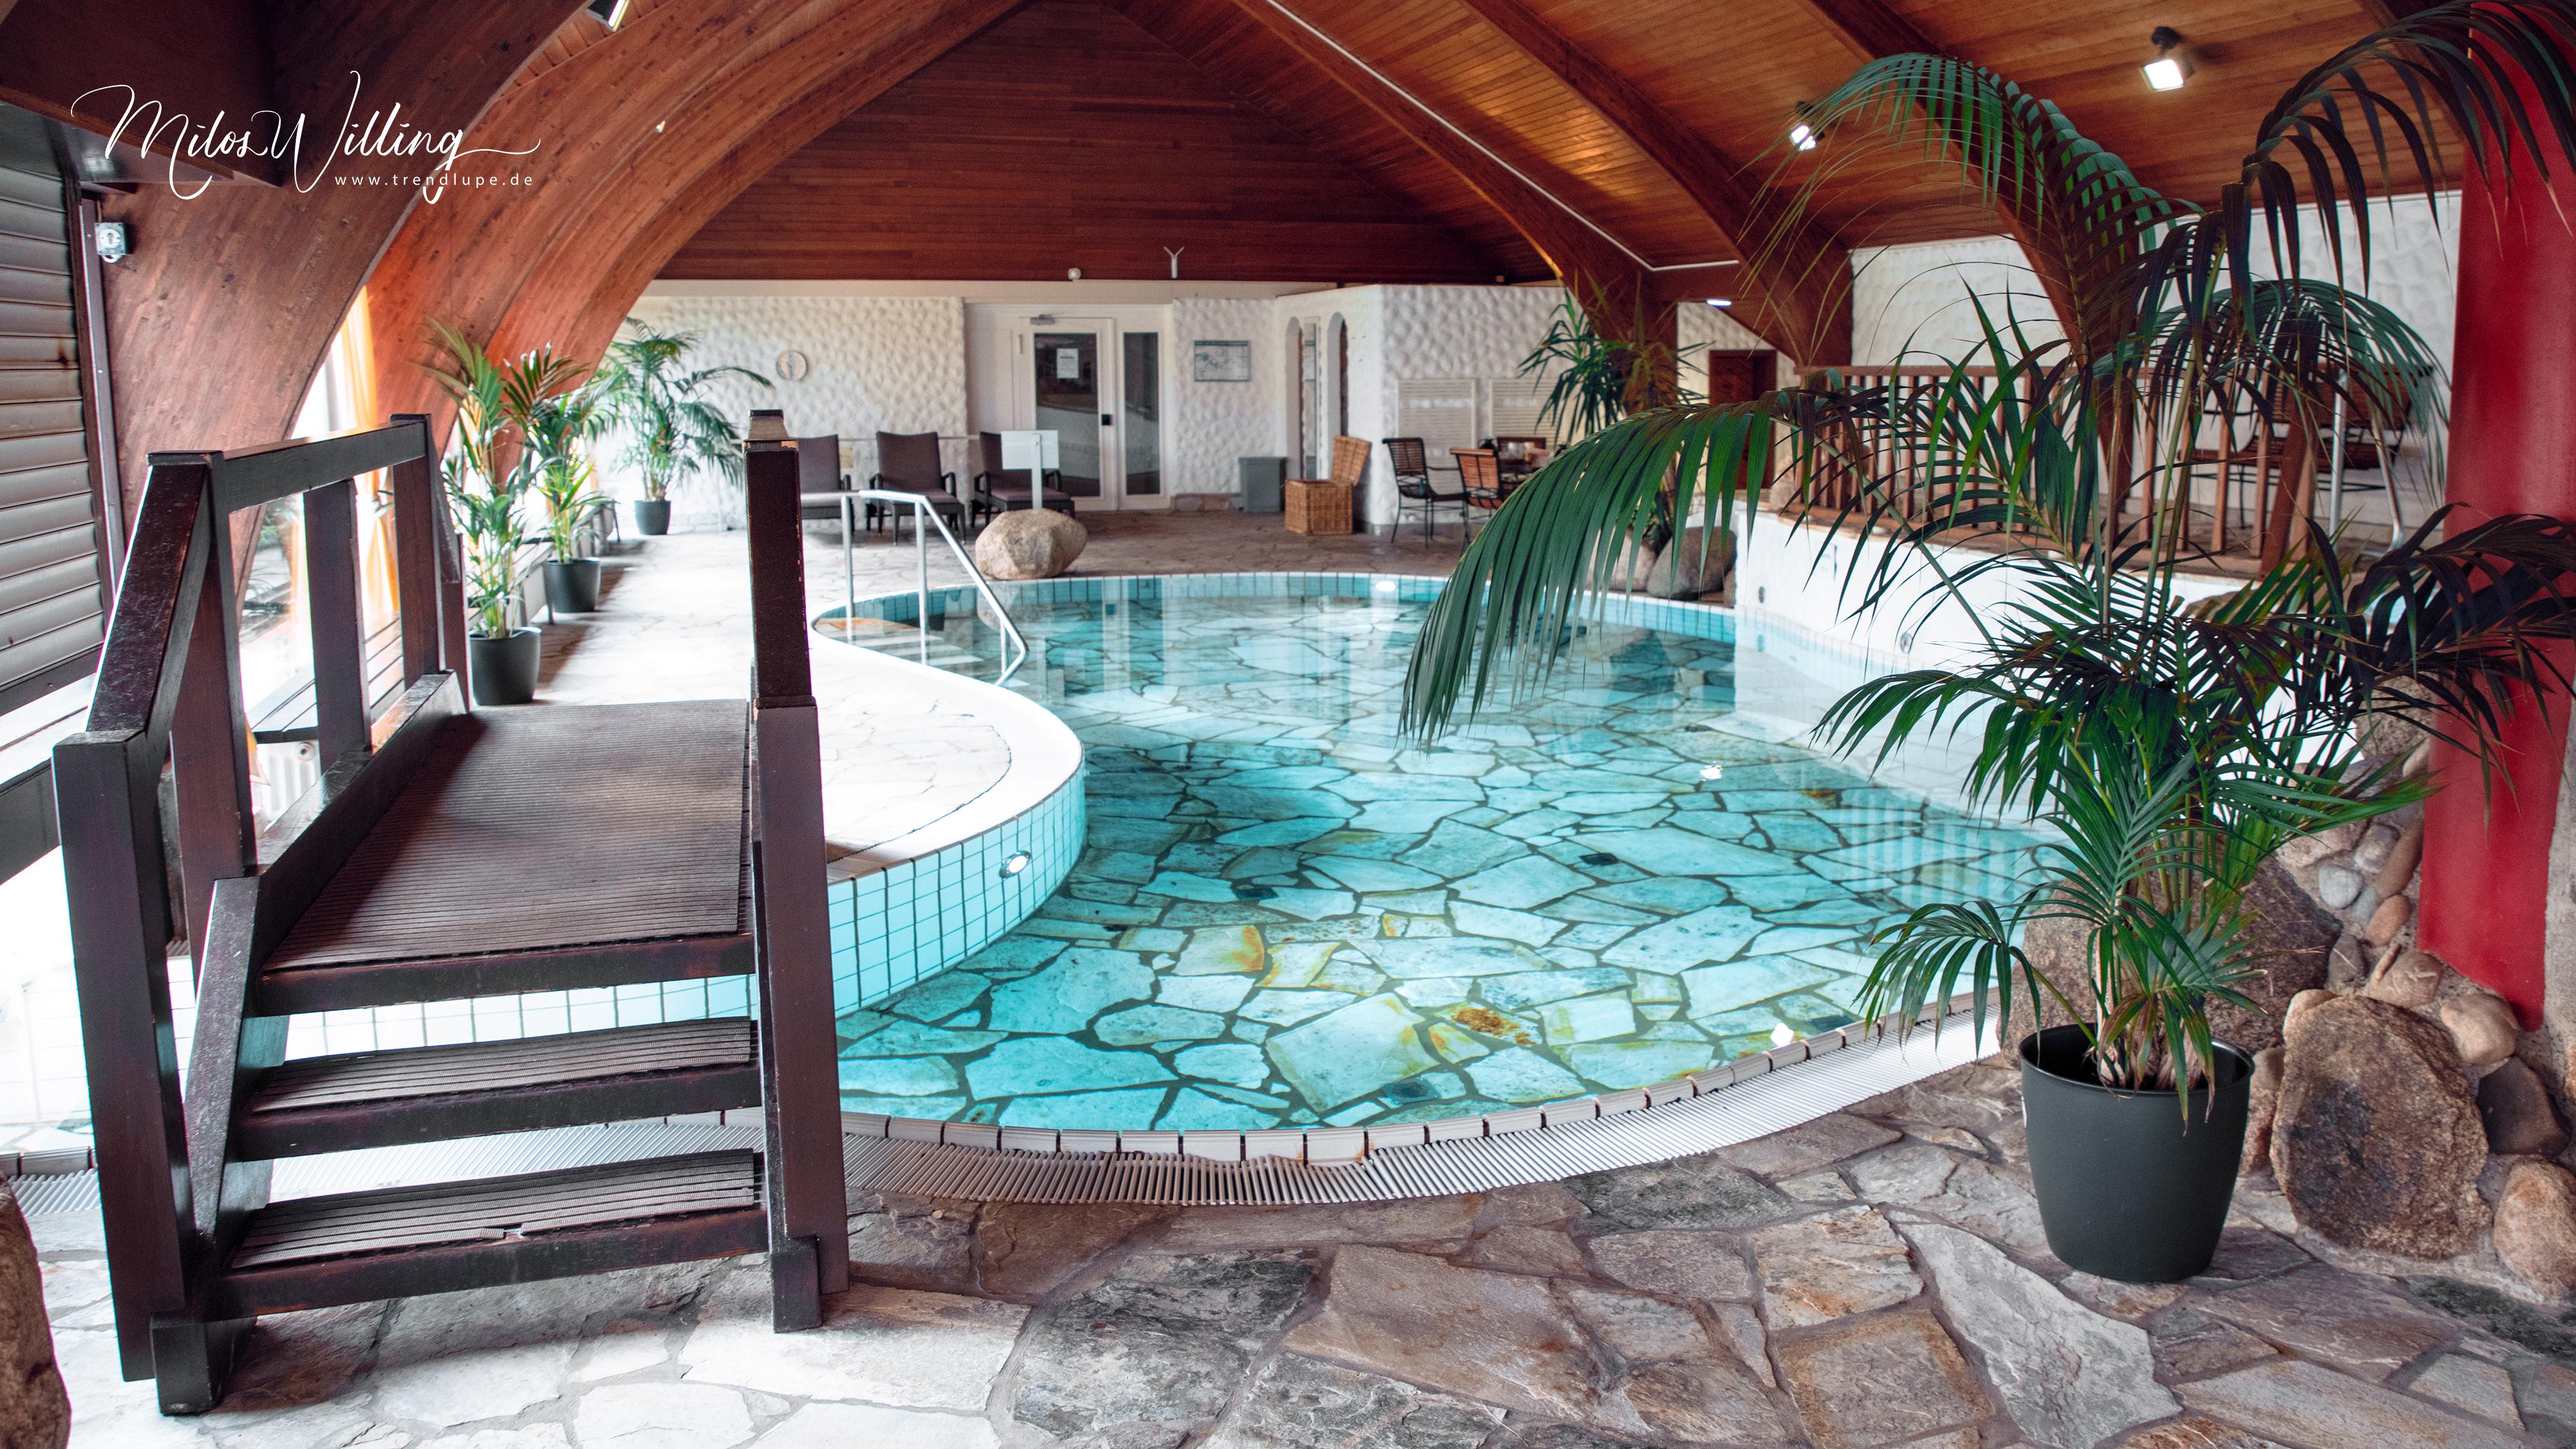 Werbung | Hotel Check: Romantik Hotel Stryckhaus